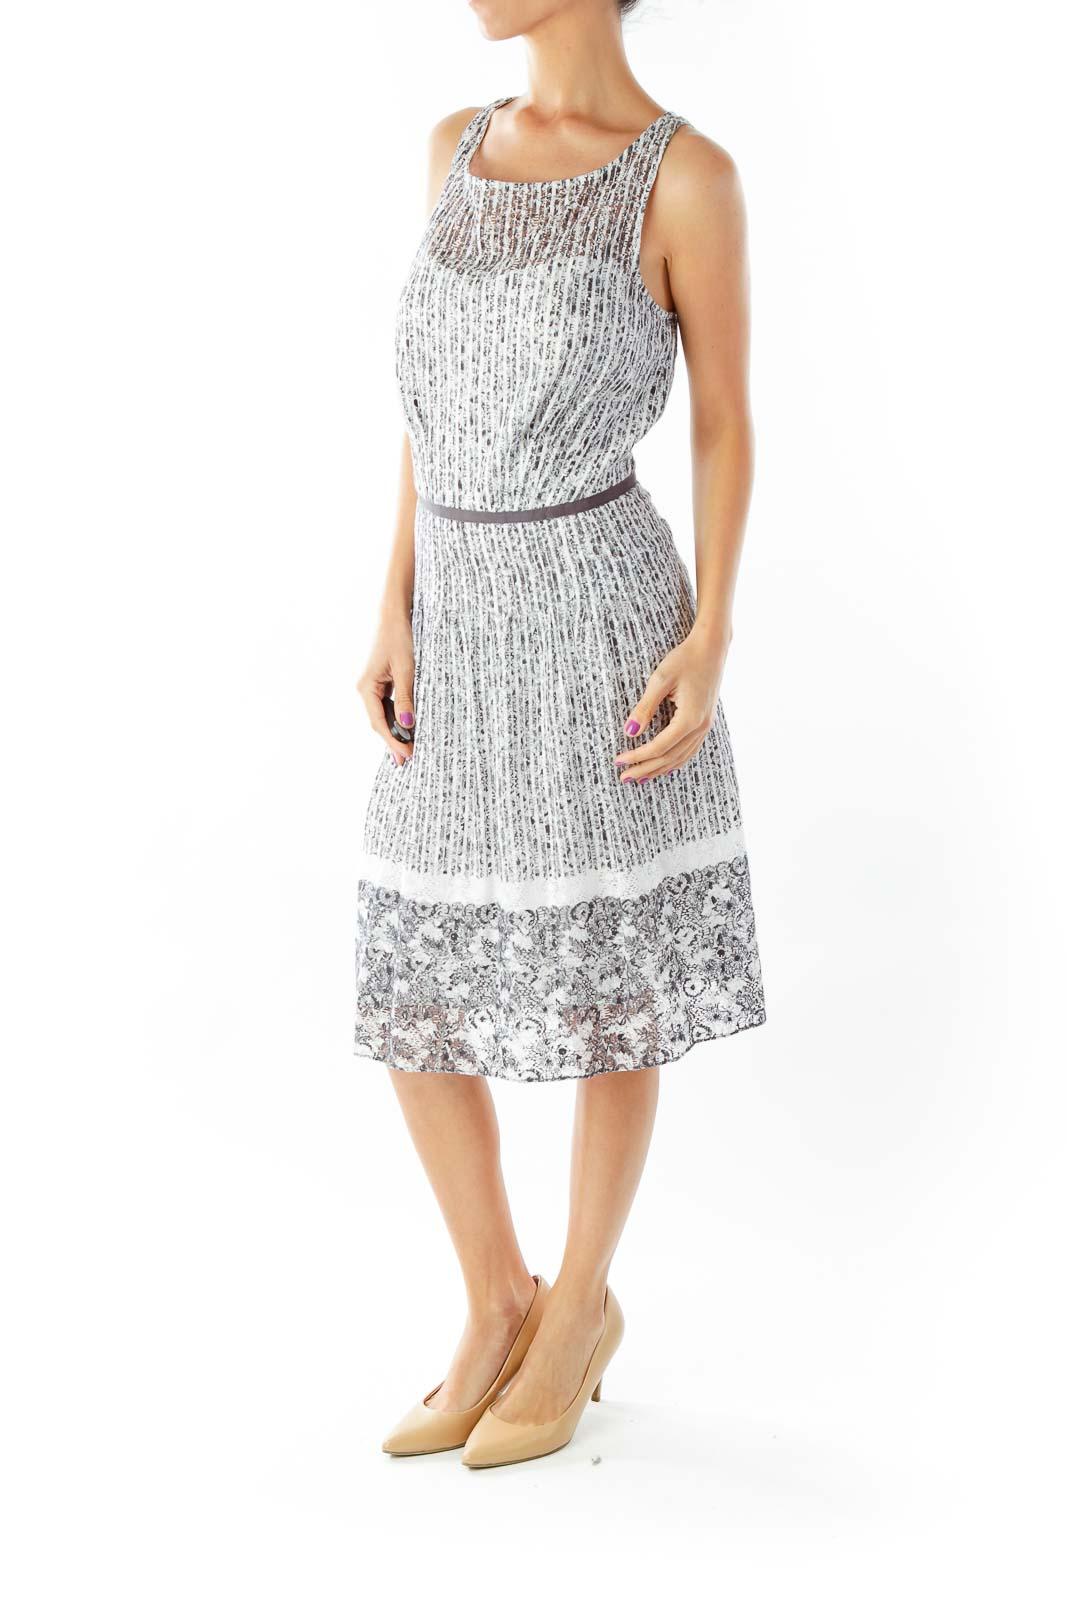 Black White Crocheted Flared Day Dress